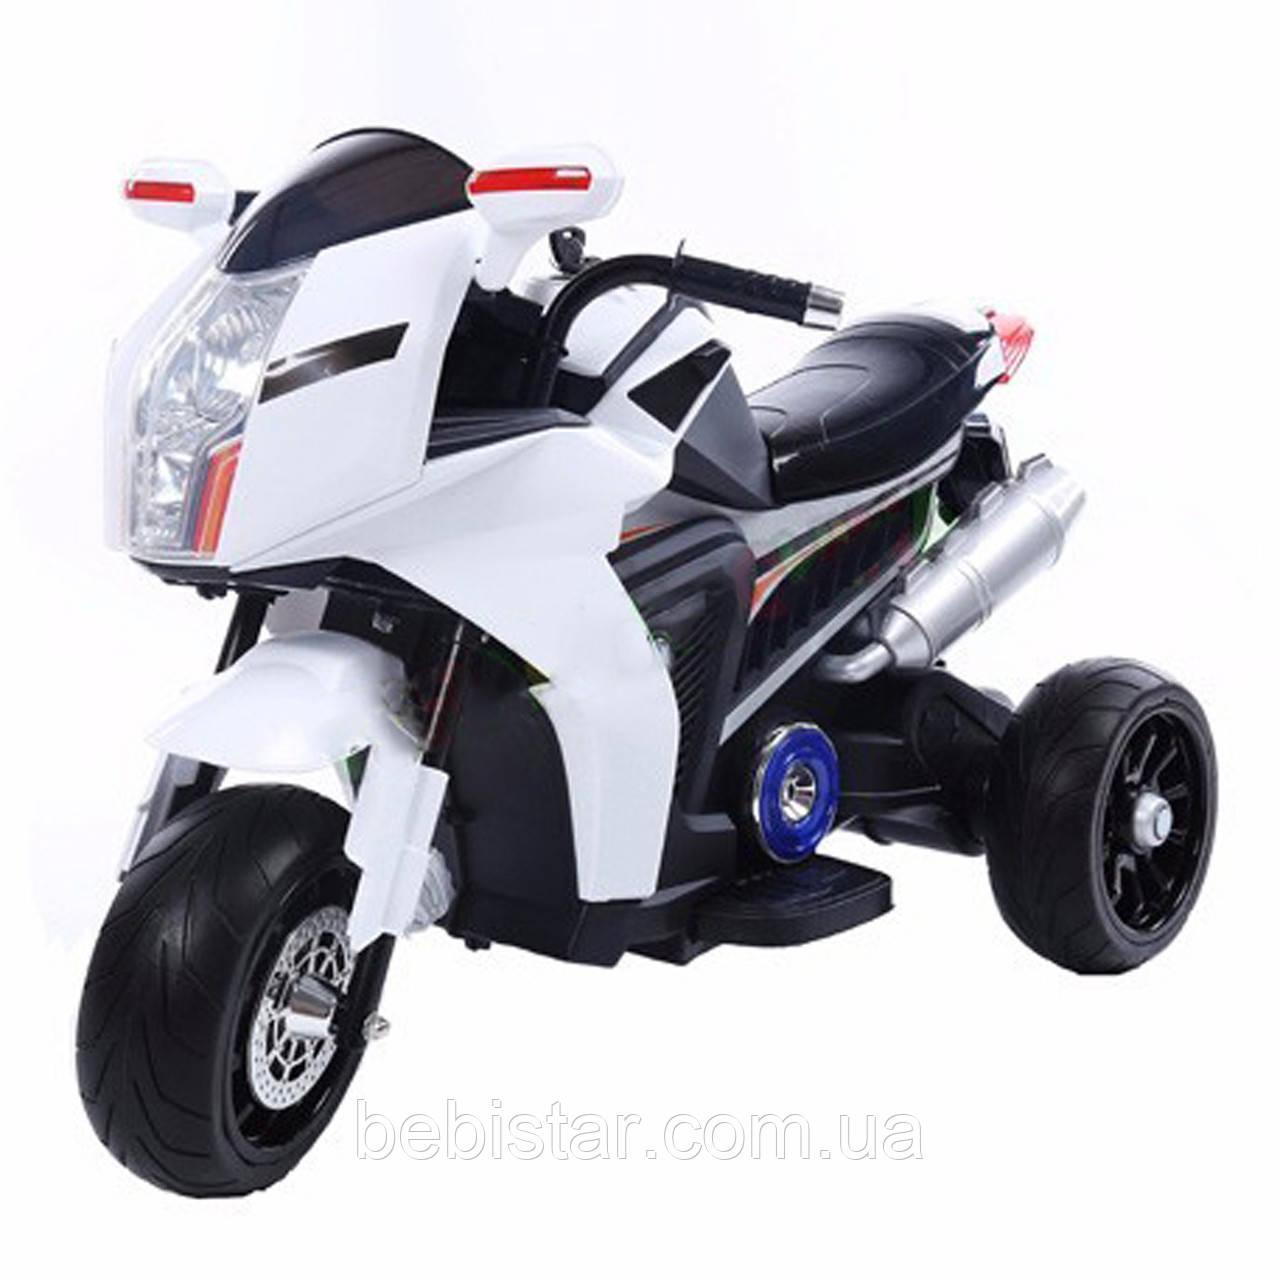 Электромобиль мотоцикл белый на EVA резине с ключом зажигания T-7213 EVA WHITE деткам 3-7 лет мотор 2*20W